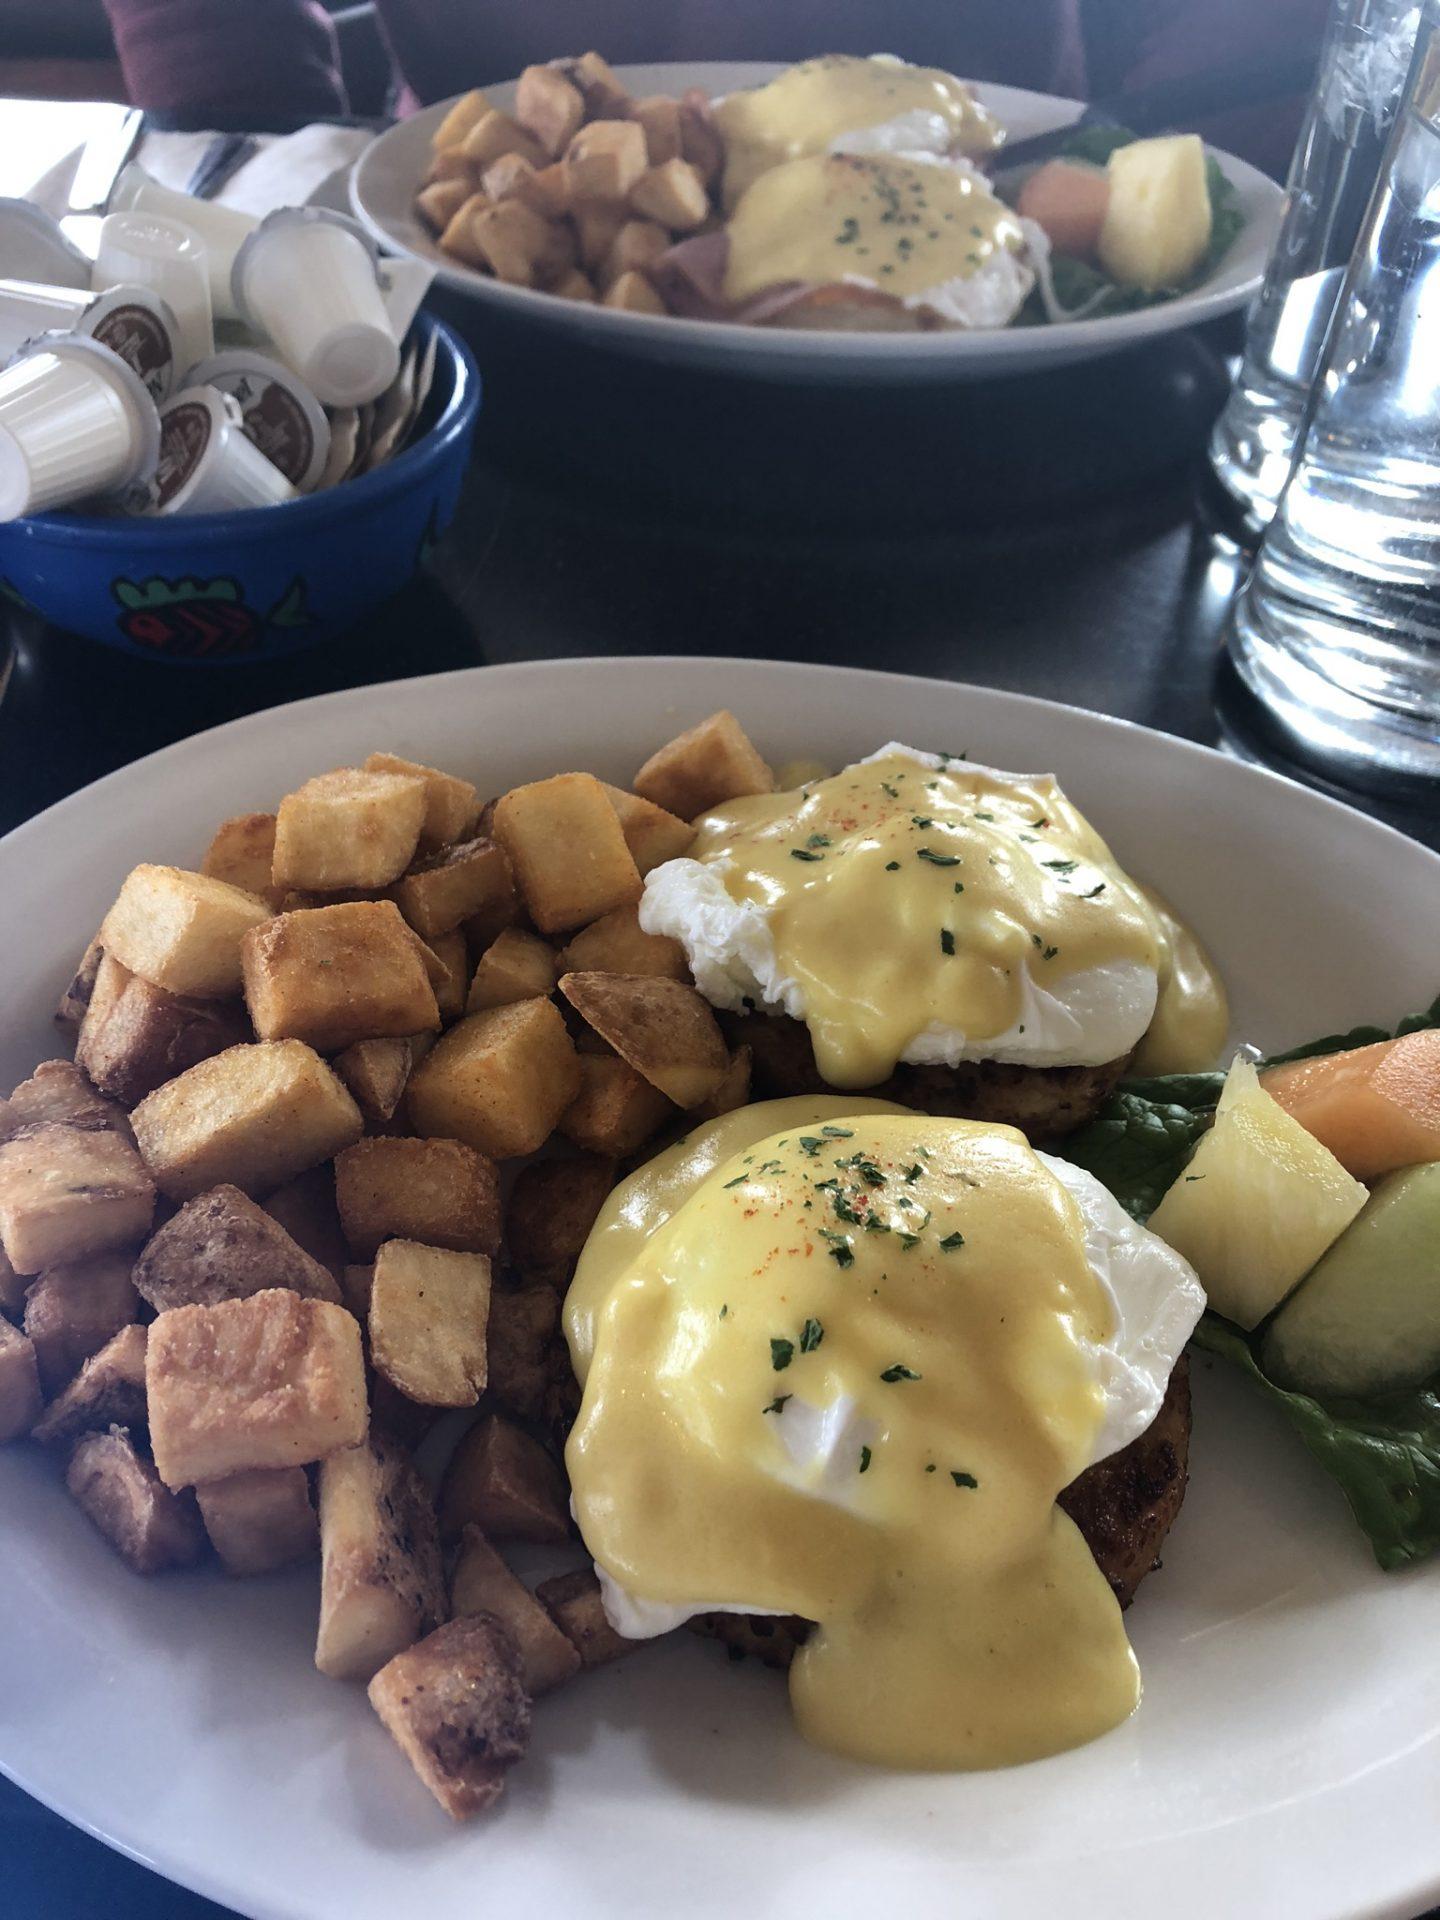 Eggs benedict from Pier Bistro, Sidney